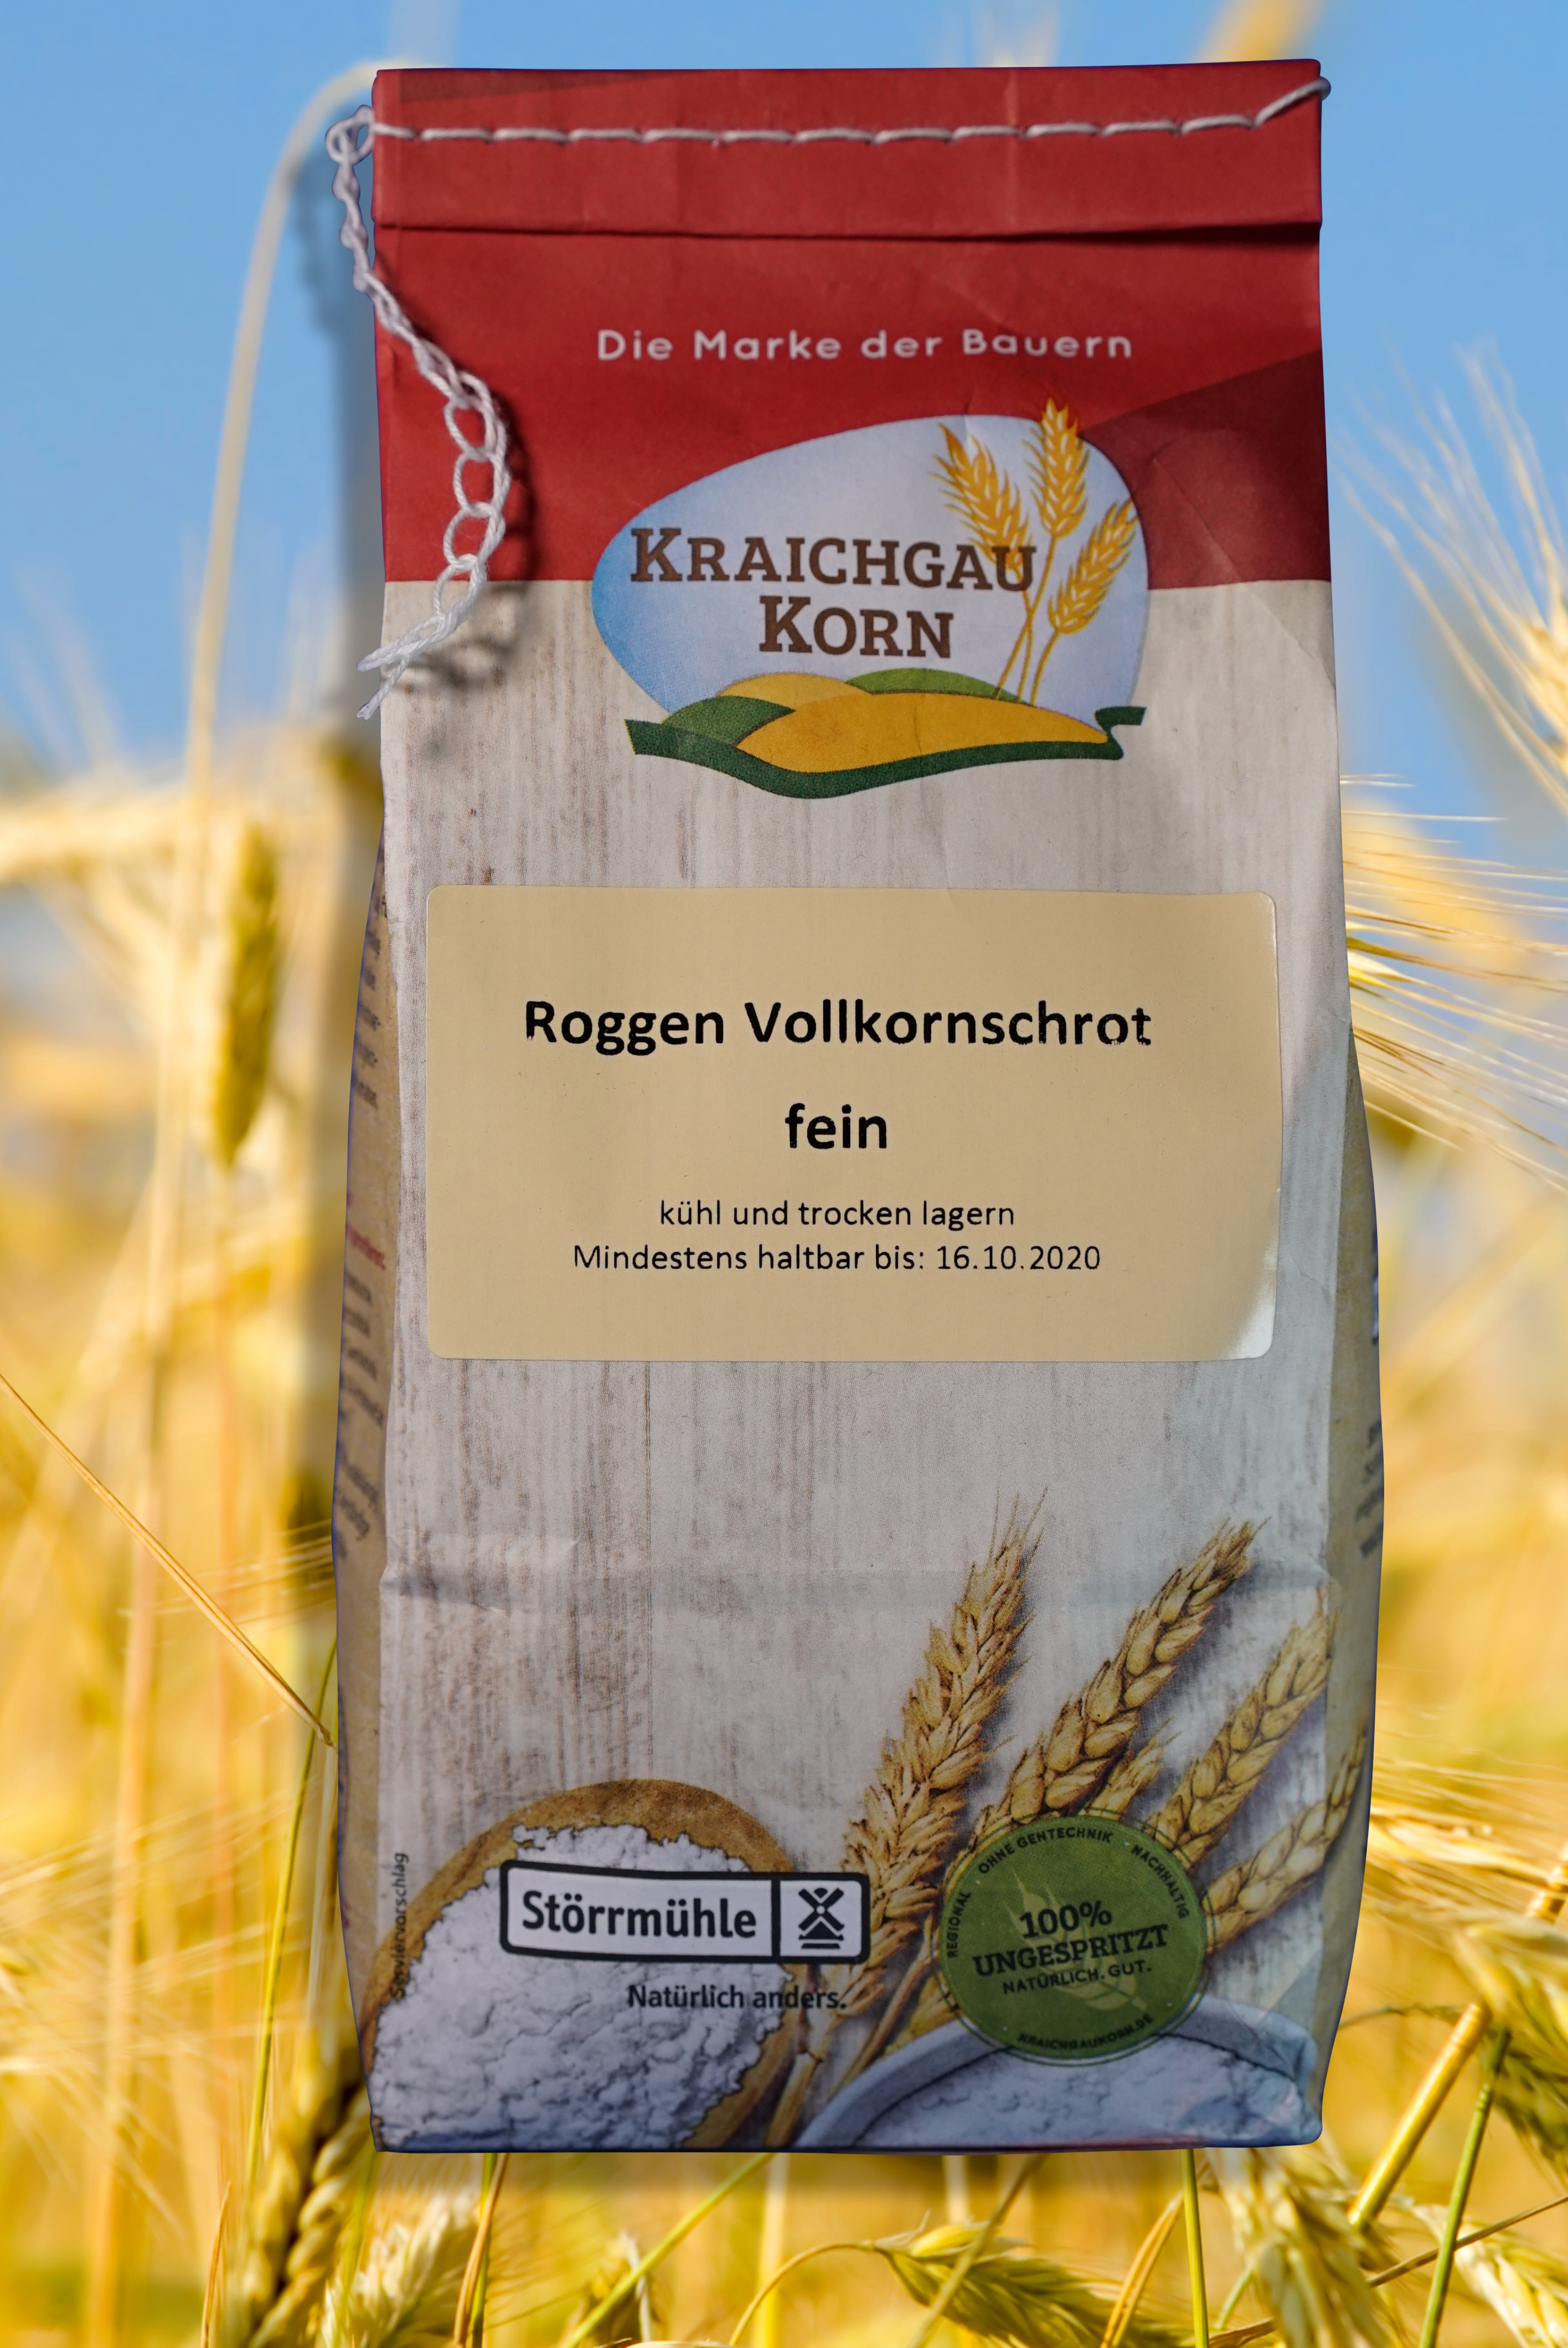 Kraichgau Korn